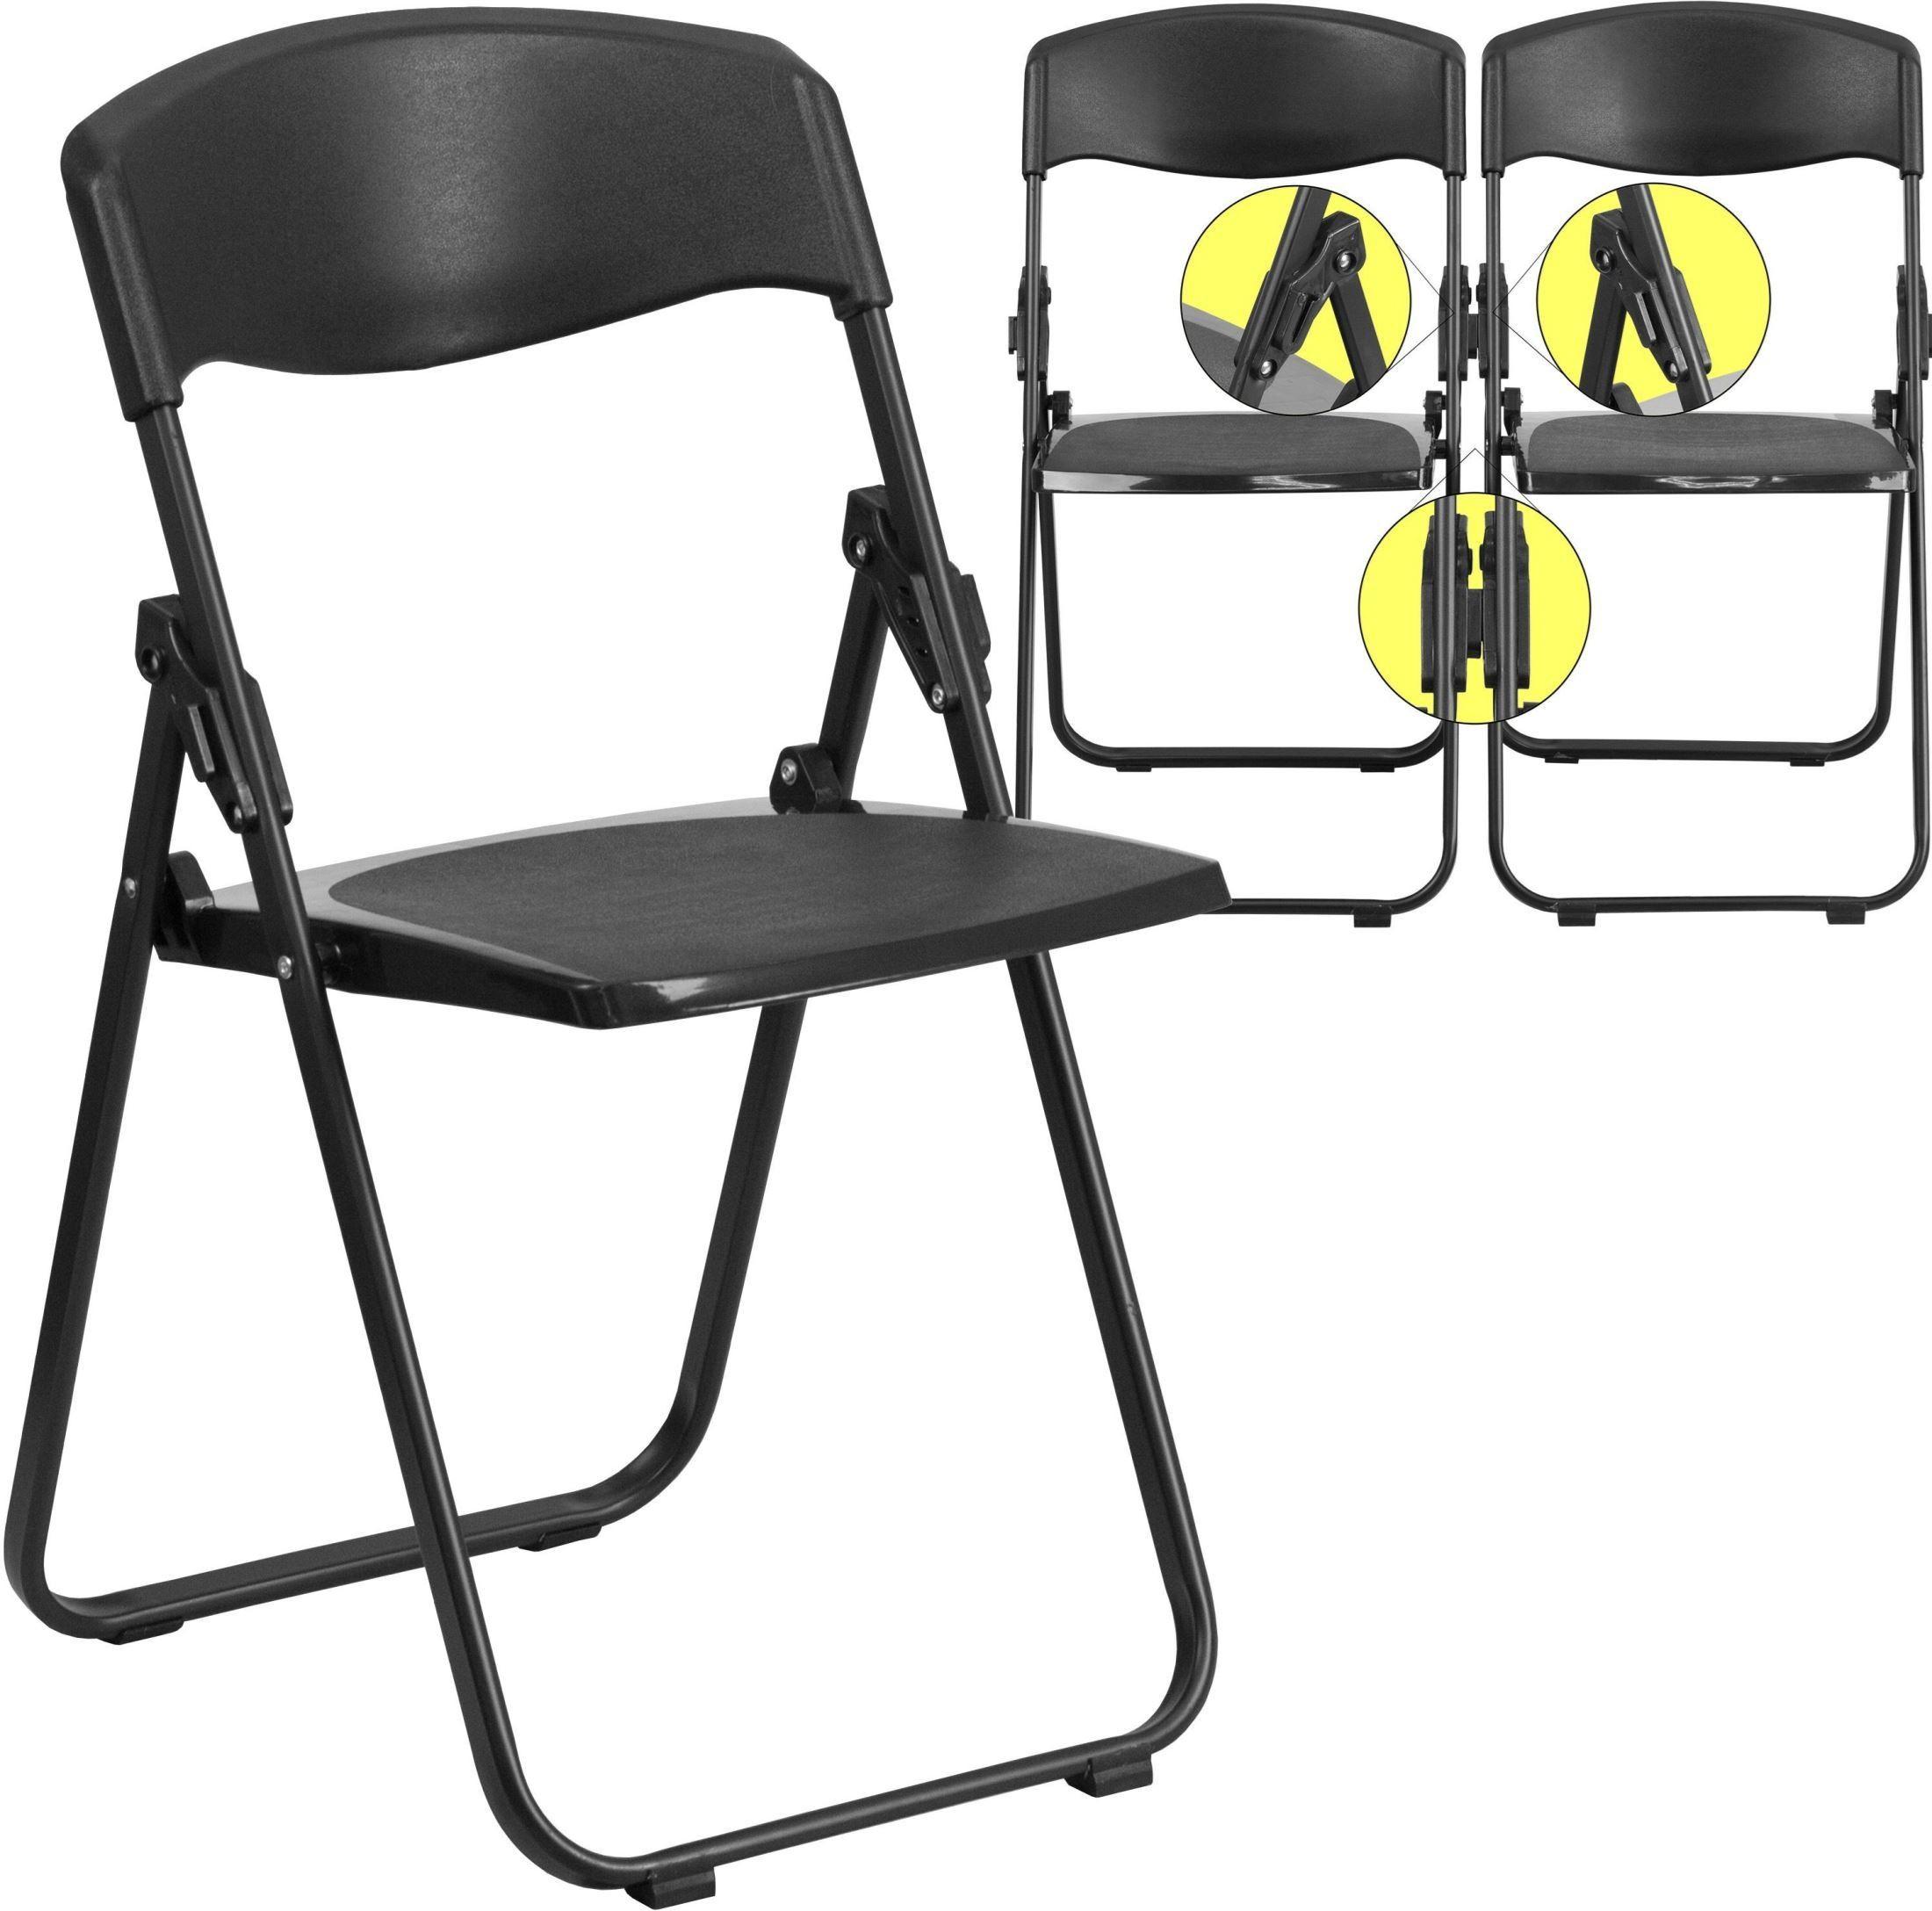 Hercules Series Heavy Duty Black Plastic Folding Chair